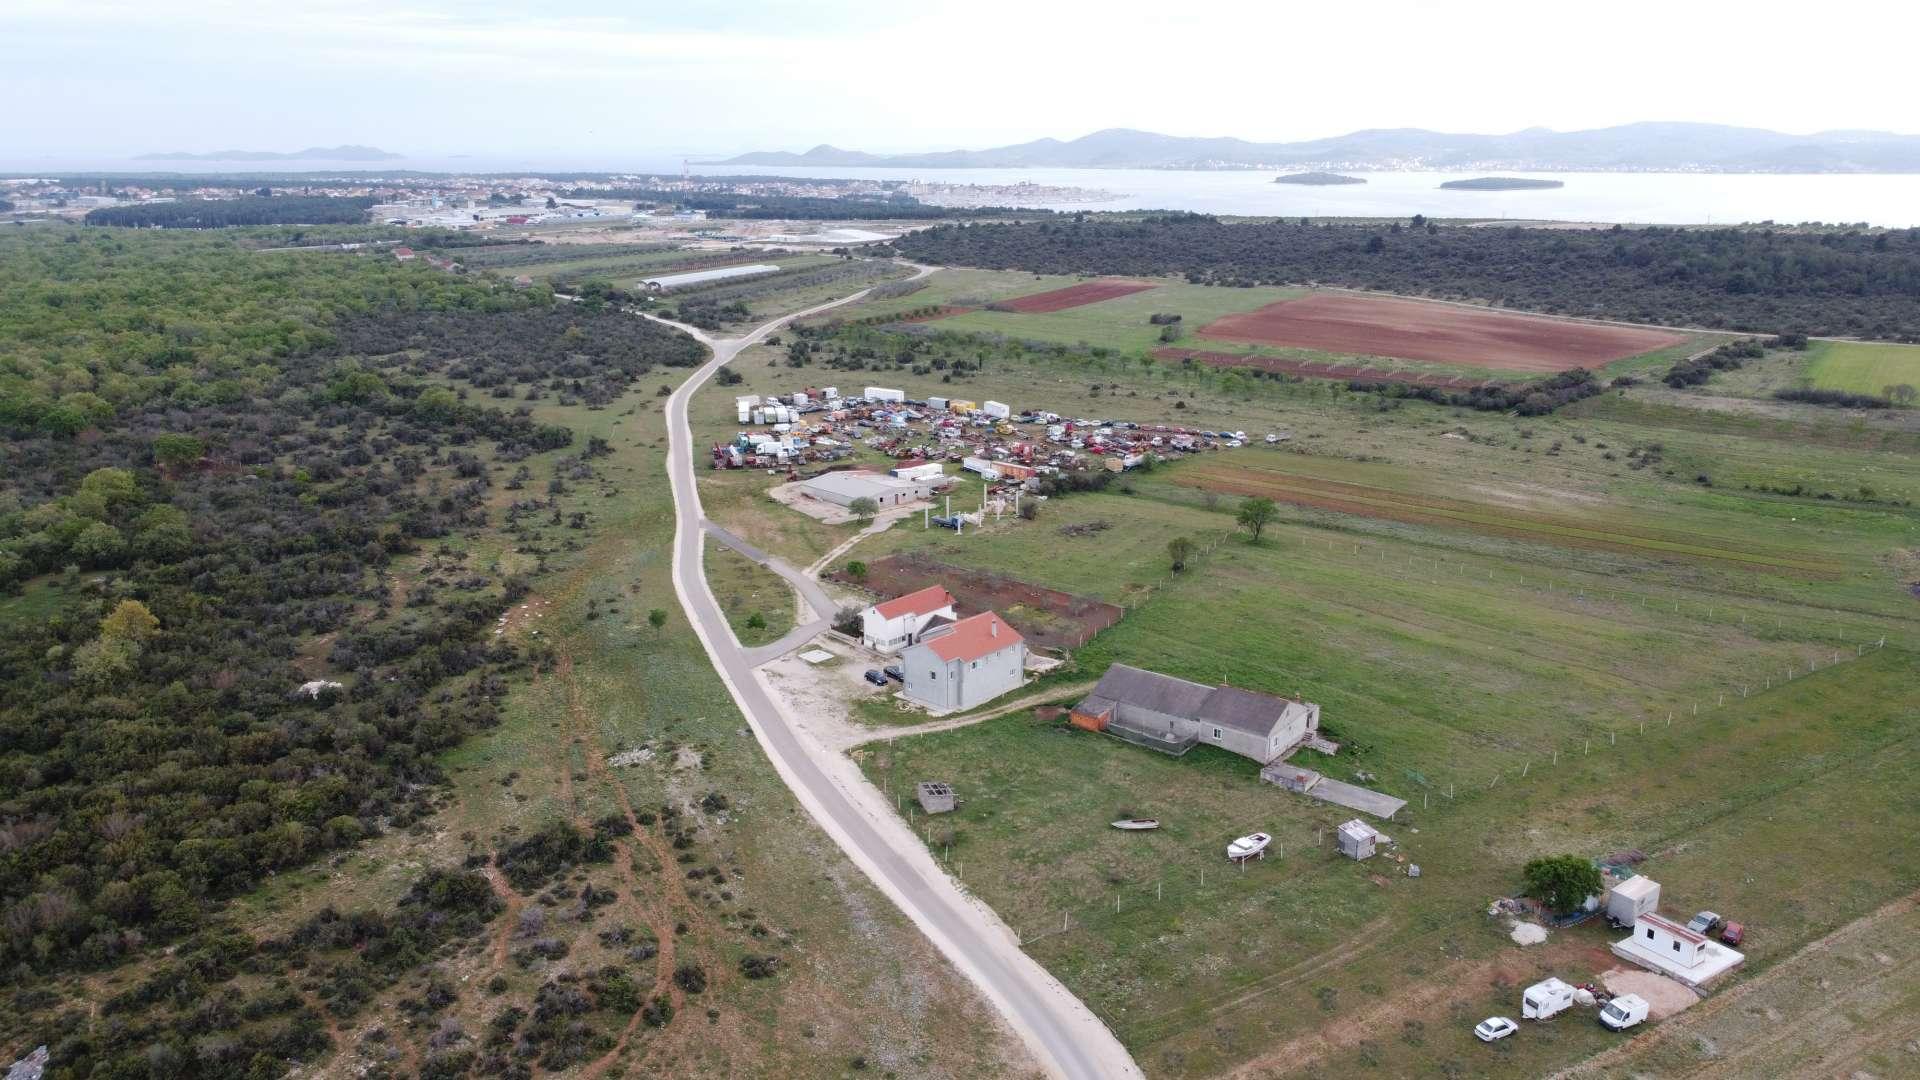 Cesta Baturovi - Biograd